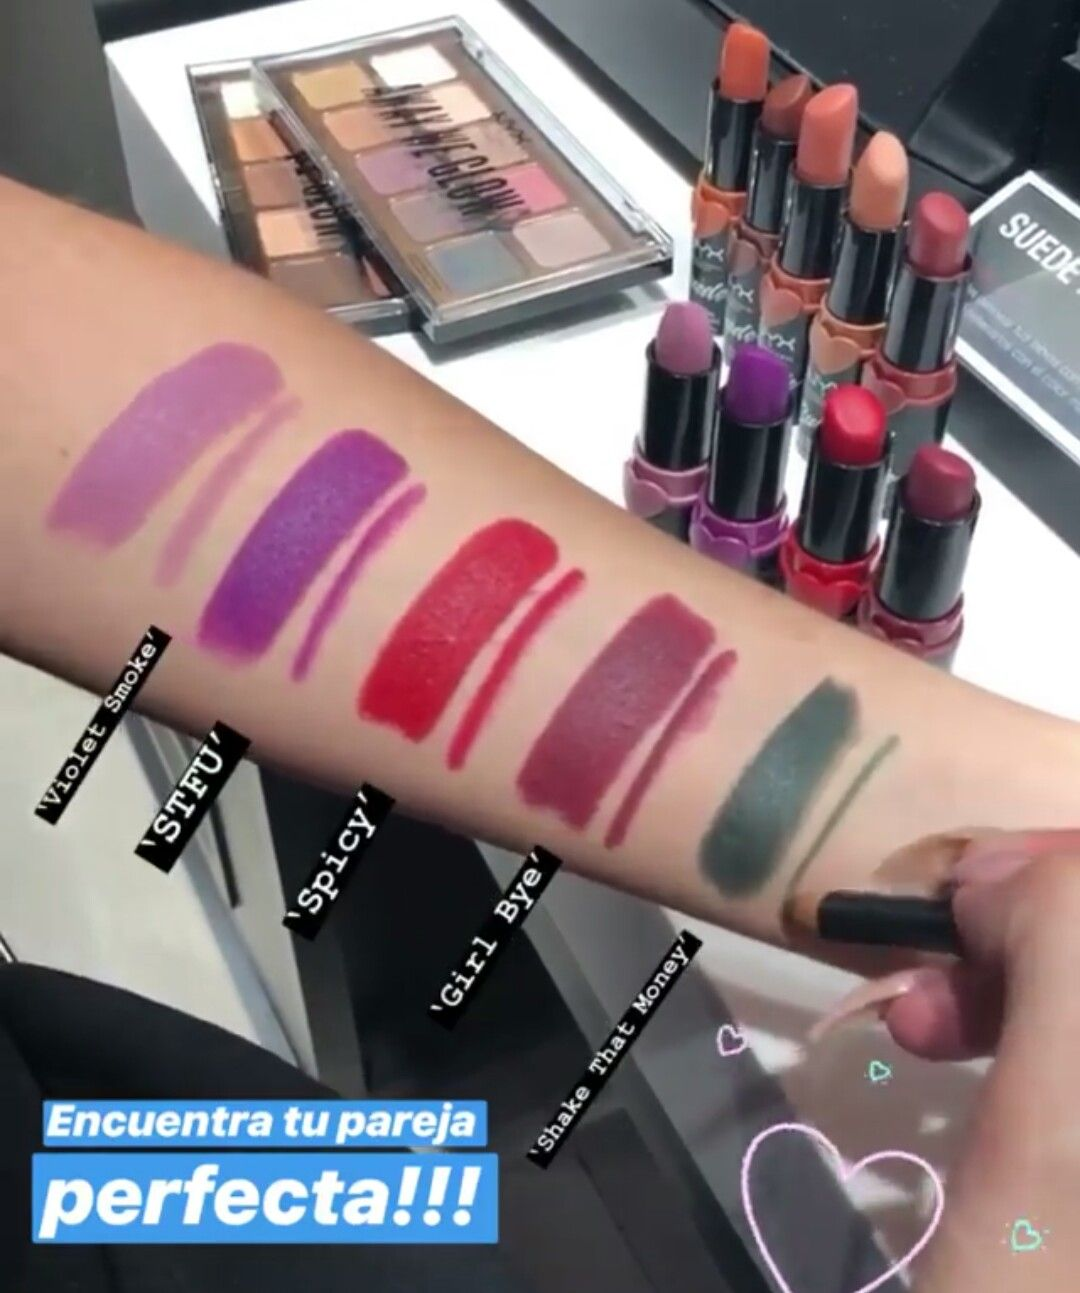 Nyx Suede Matte Lipsticks Swatches Nyx Lips Makeup Inspo